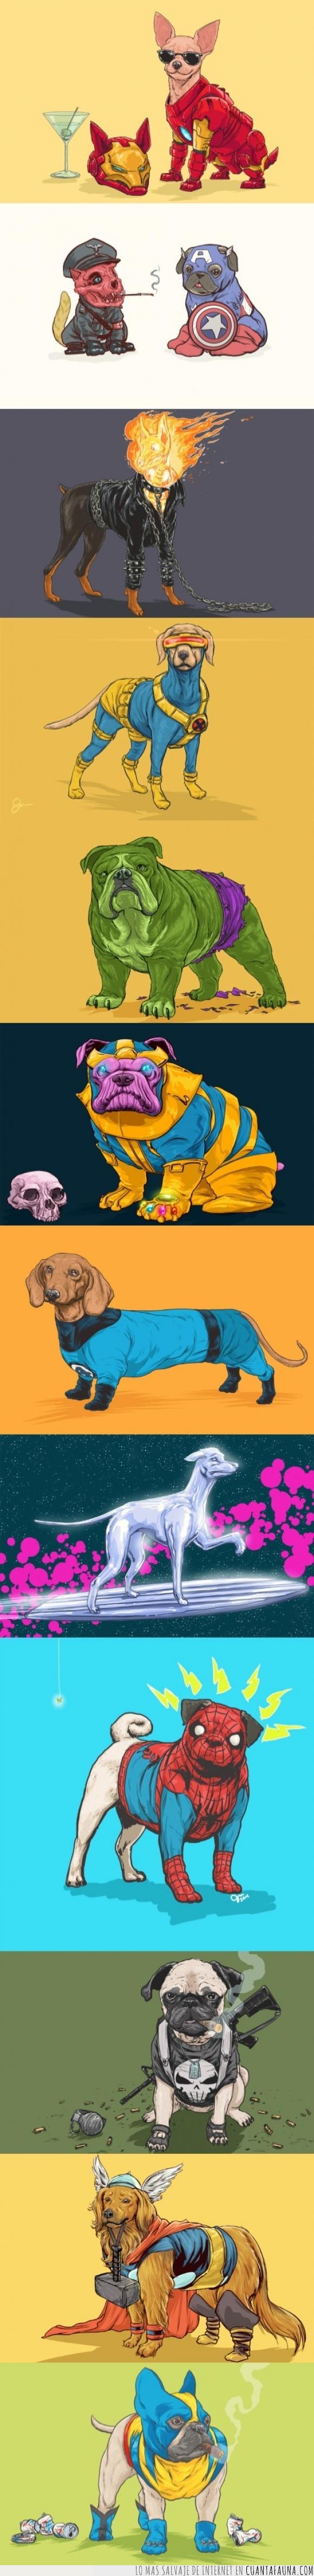 comic,Hulk,Iron Man,Marvel,perro,Silver surfer,Thor,Wolverine